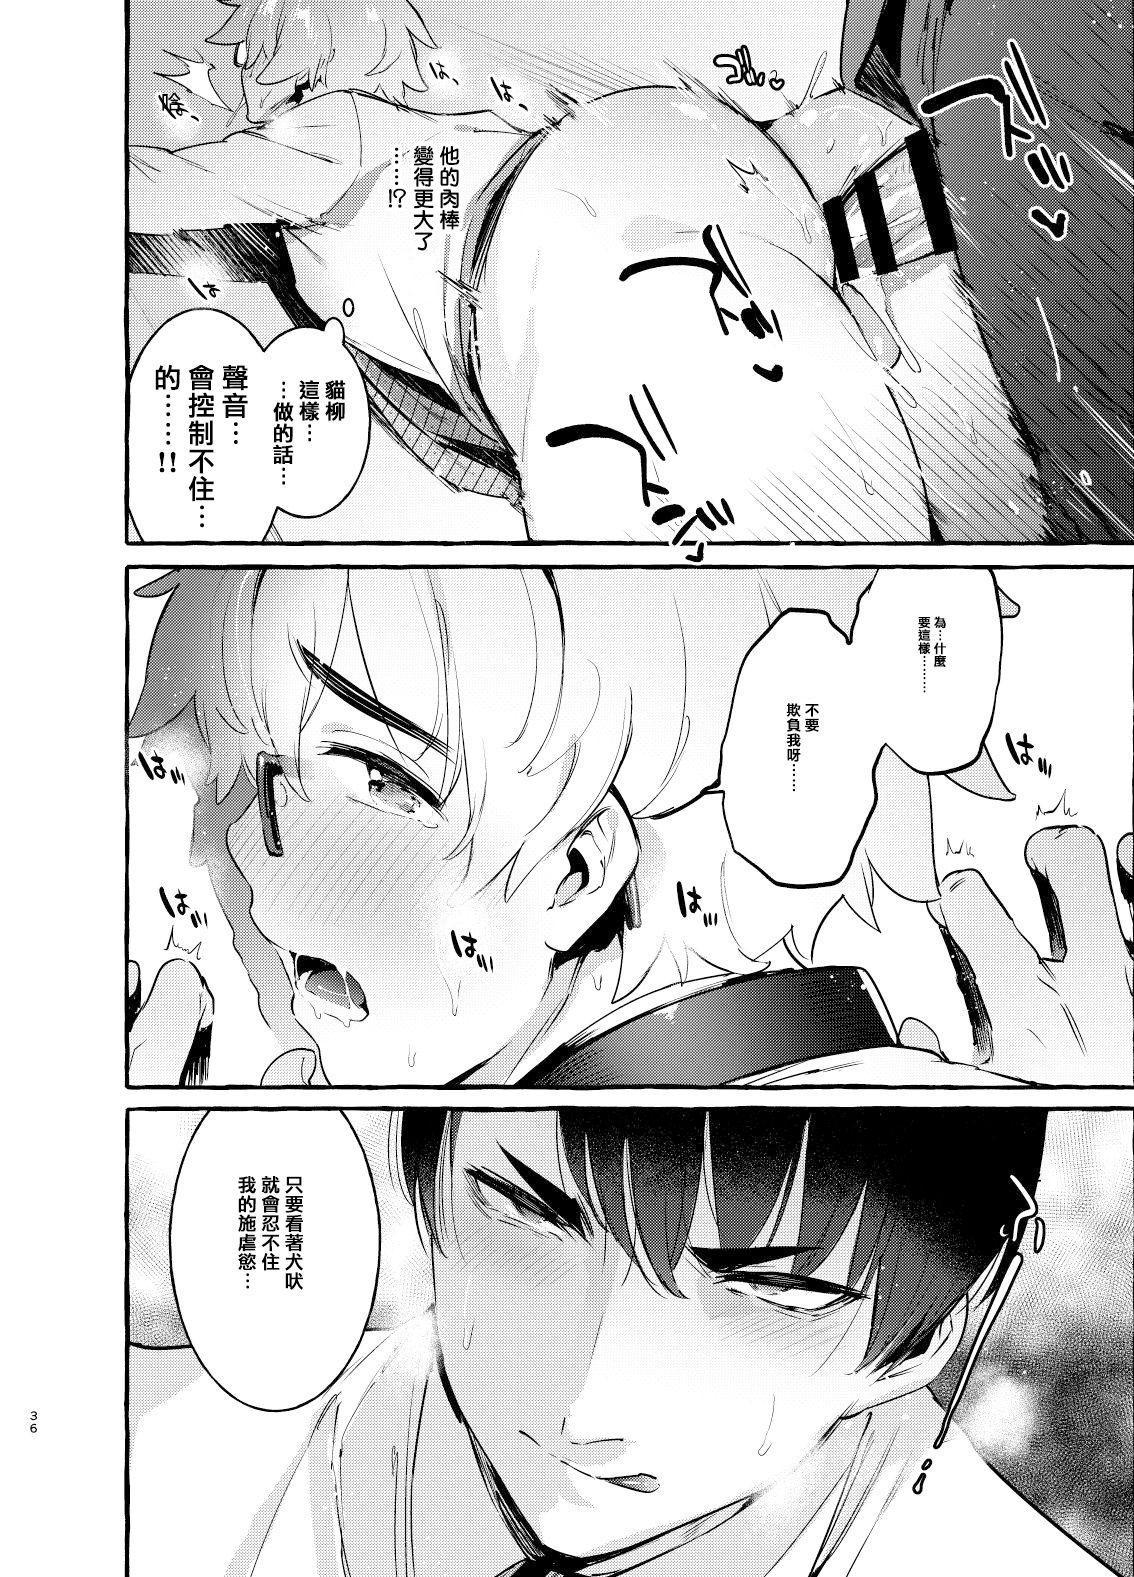 [Otosan no Kurorekishi (Maemukina Do M)]  Wanwan Otou-san   犬系爸爸 01-02 [Chinese] [拾荒者汉化组] [Digital] 36